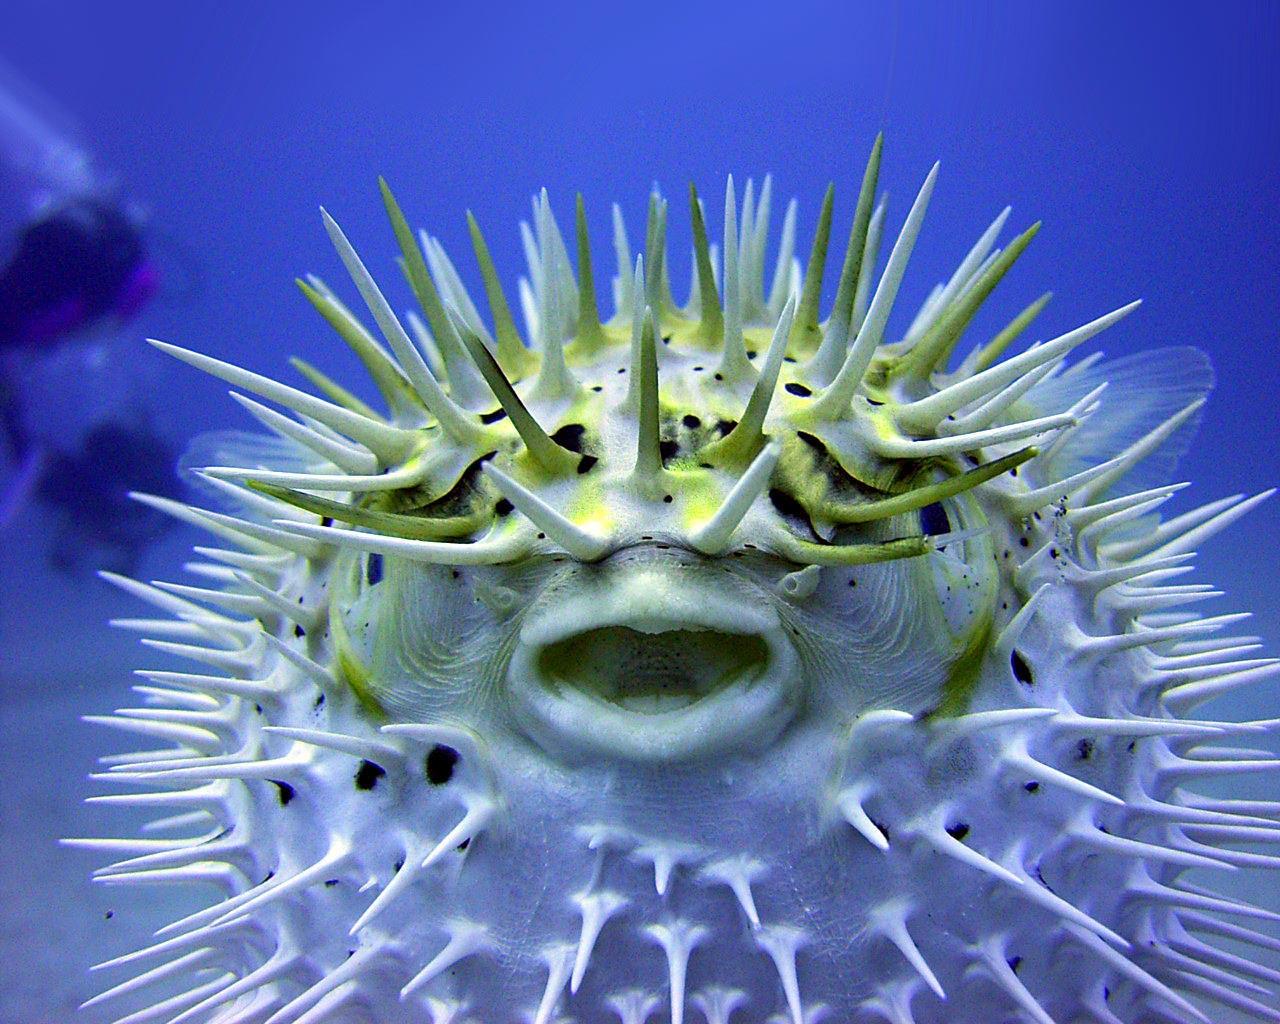 http://2.bp.blogspot.com/-3viT1k5BIx4/Tvk6fs5WodI/AAAAAAAAA68/zhNNltmQ-8w/s1600/The_Puffer_Fish.jpg